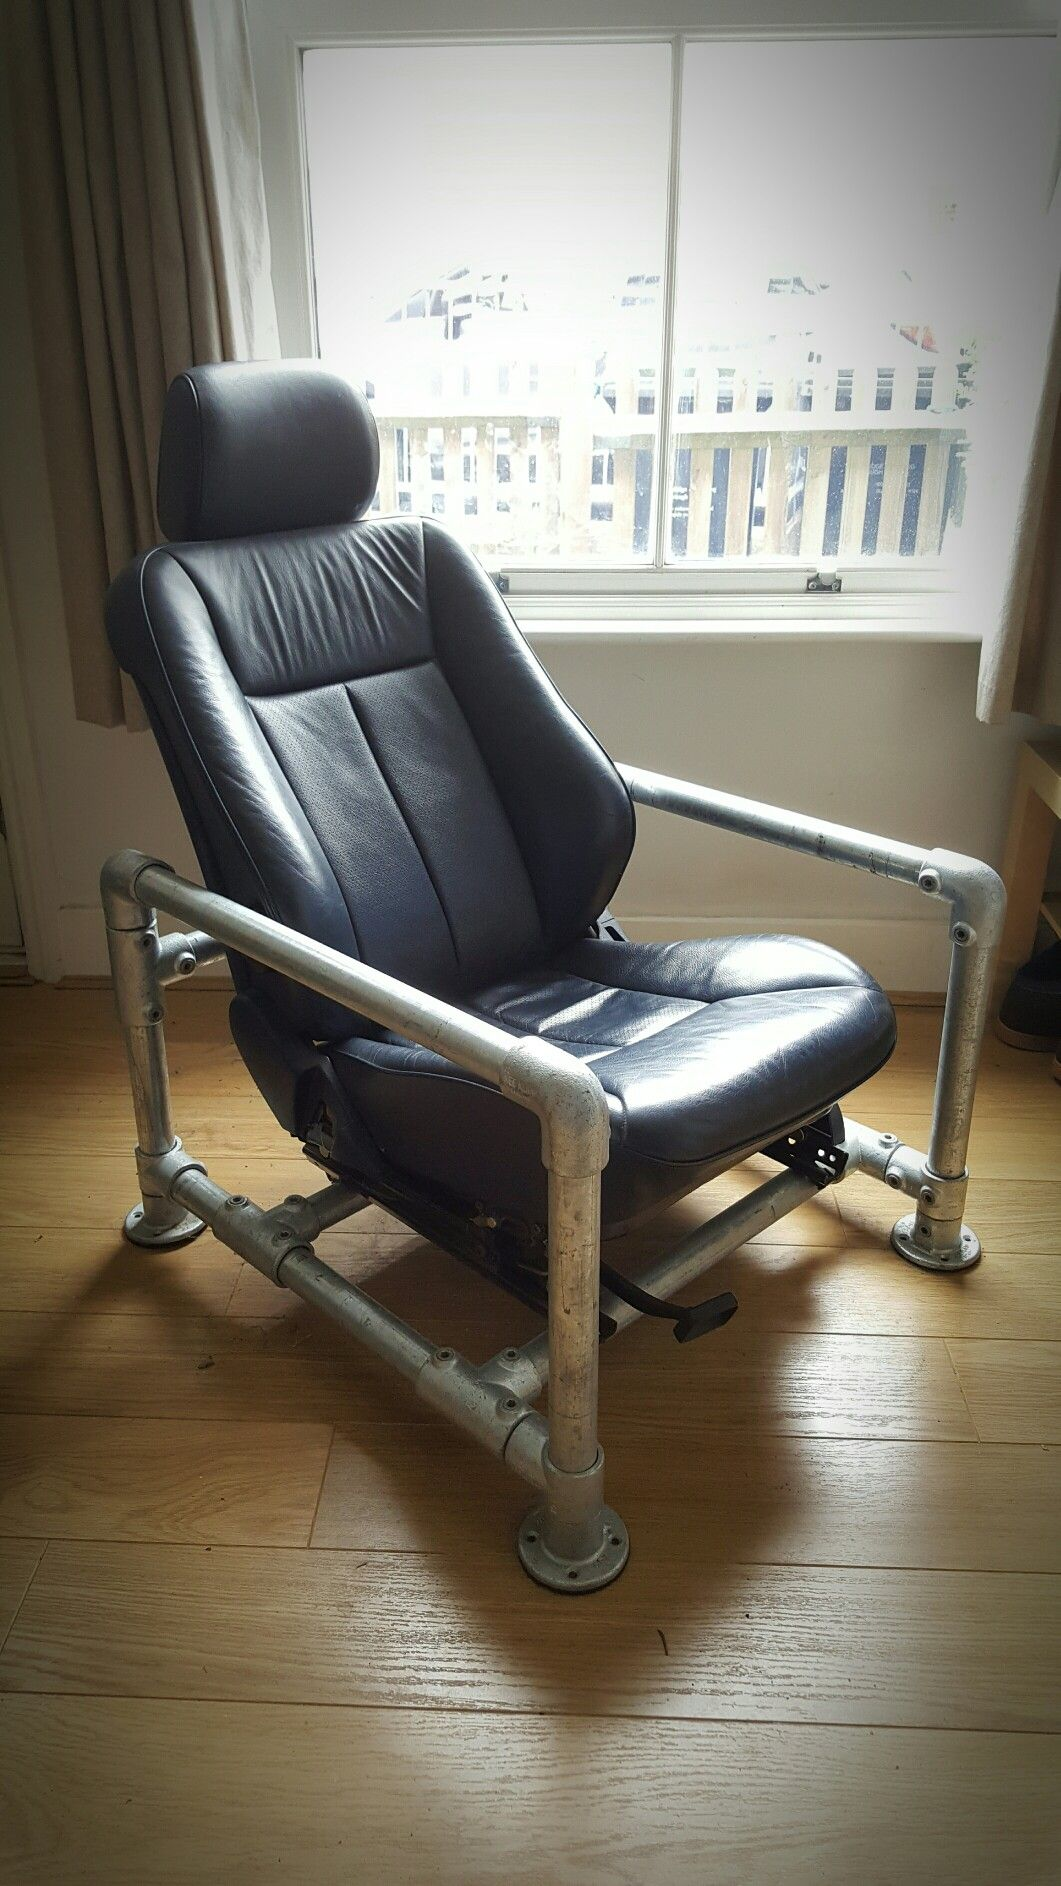 cars sofa chair bed outlet toronto keeklamp car seat man  pinteres